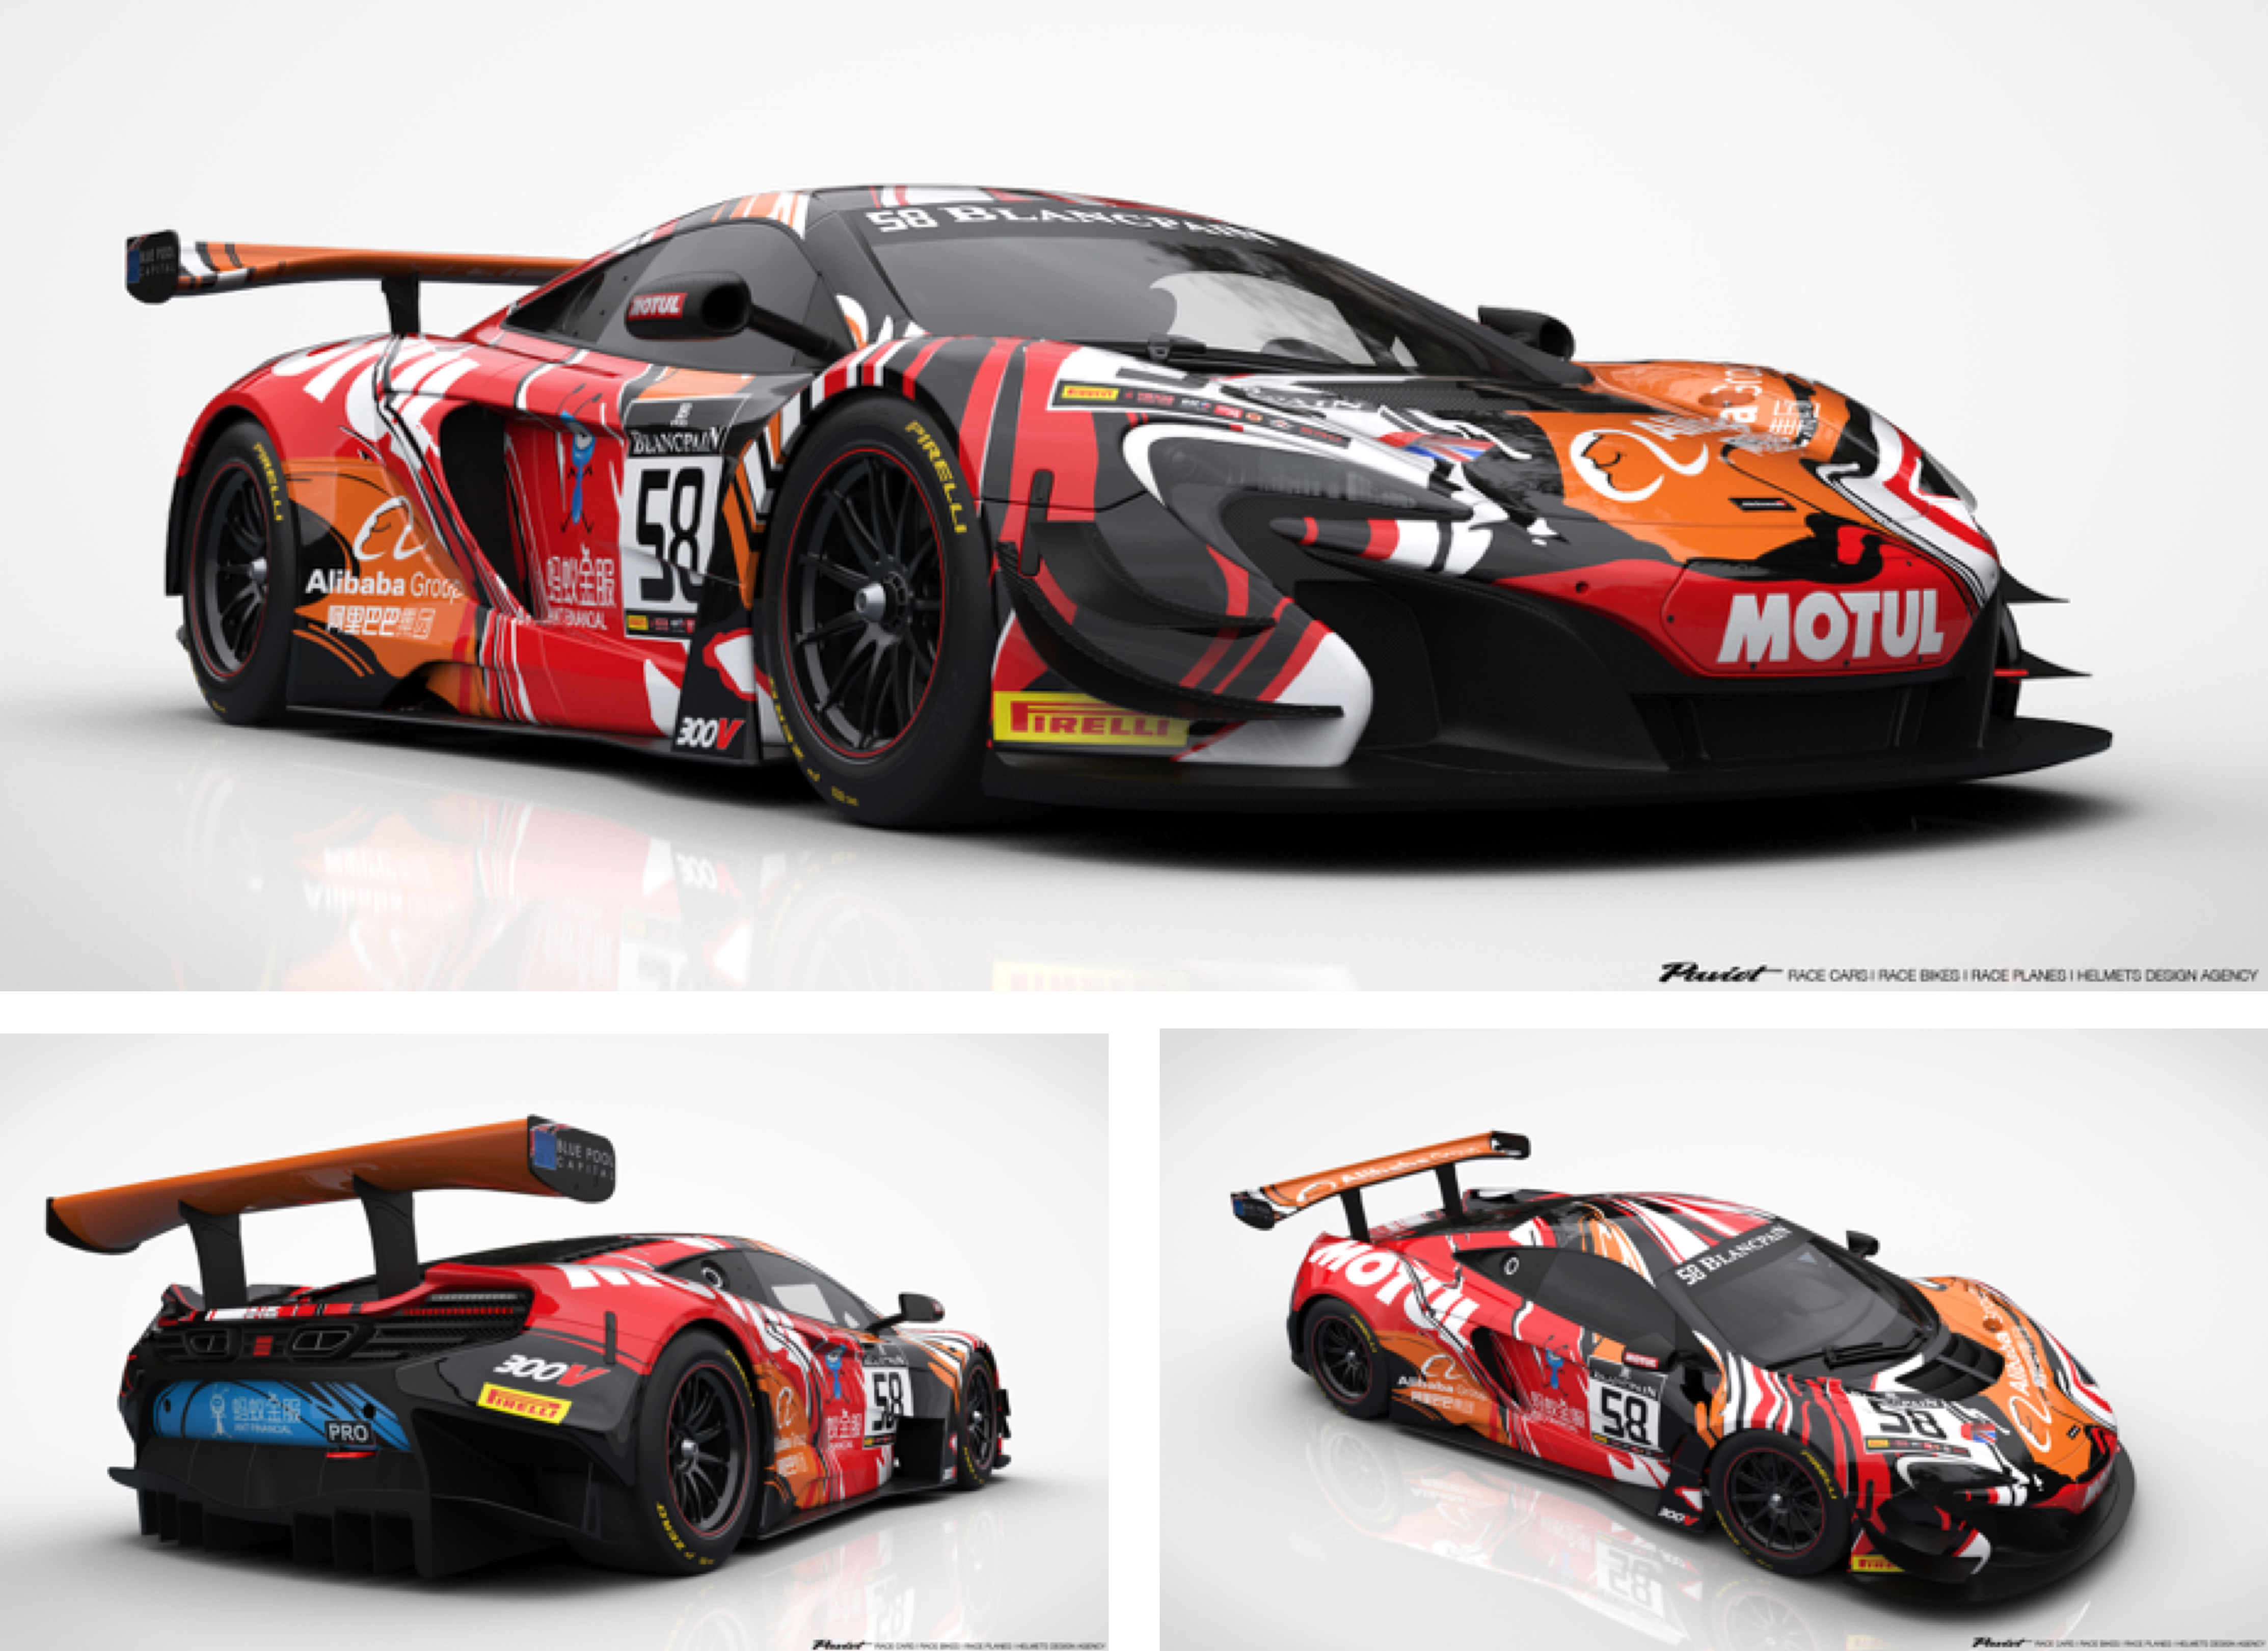 Motul introduces stunning new Ki'Win livery design concept